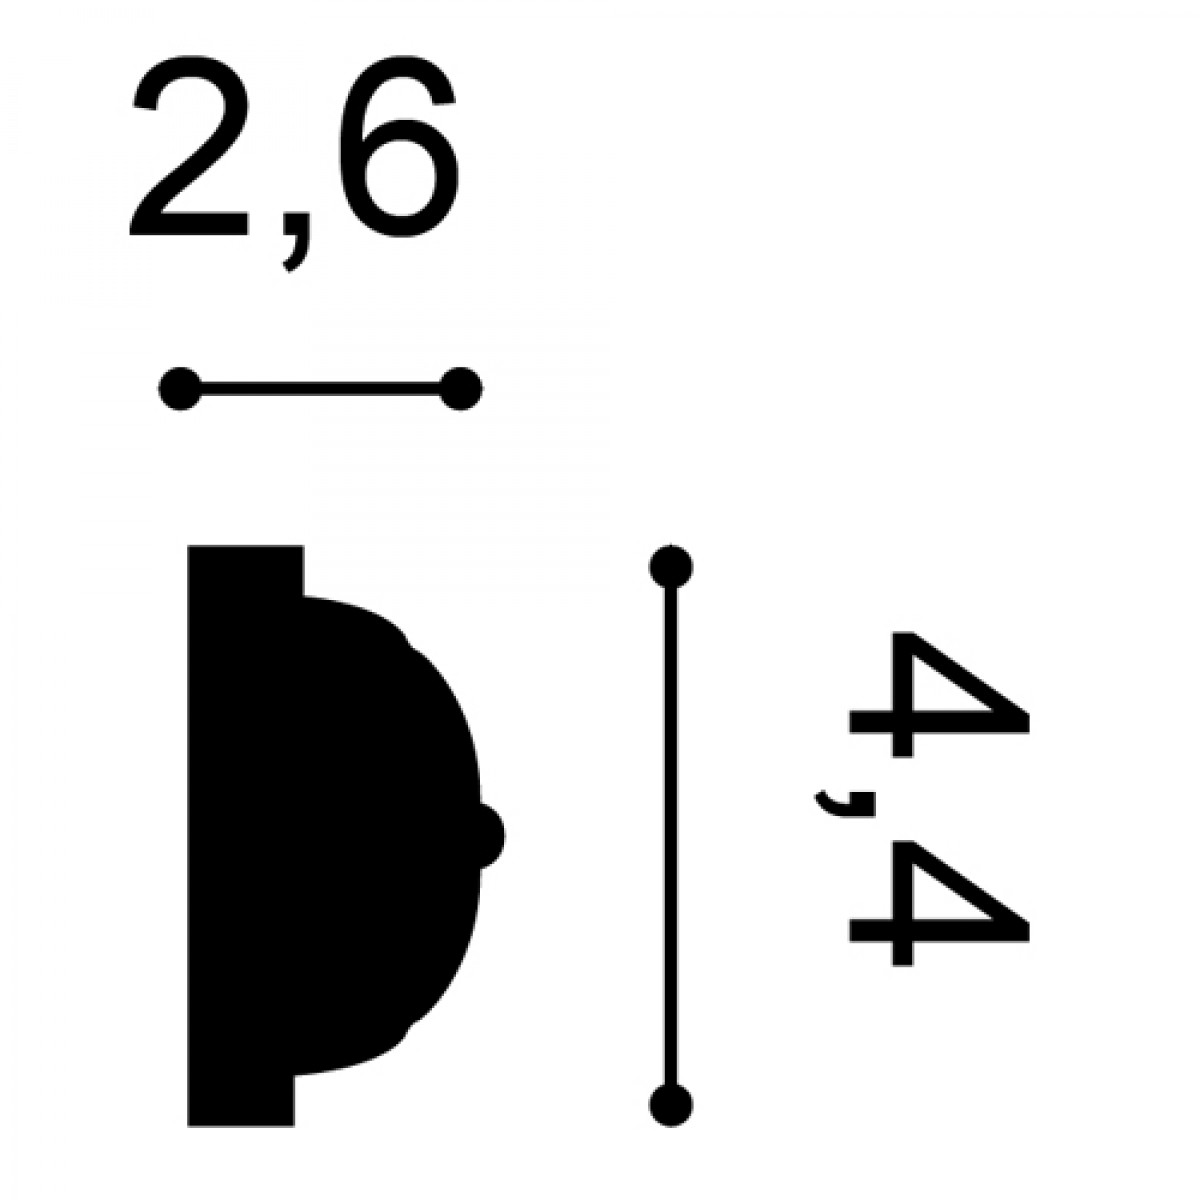 Brau Luxxus P2020, Dimensiuni: 200 X 4.4 X 2.6 cm, Orac Decor